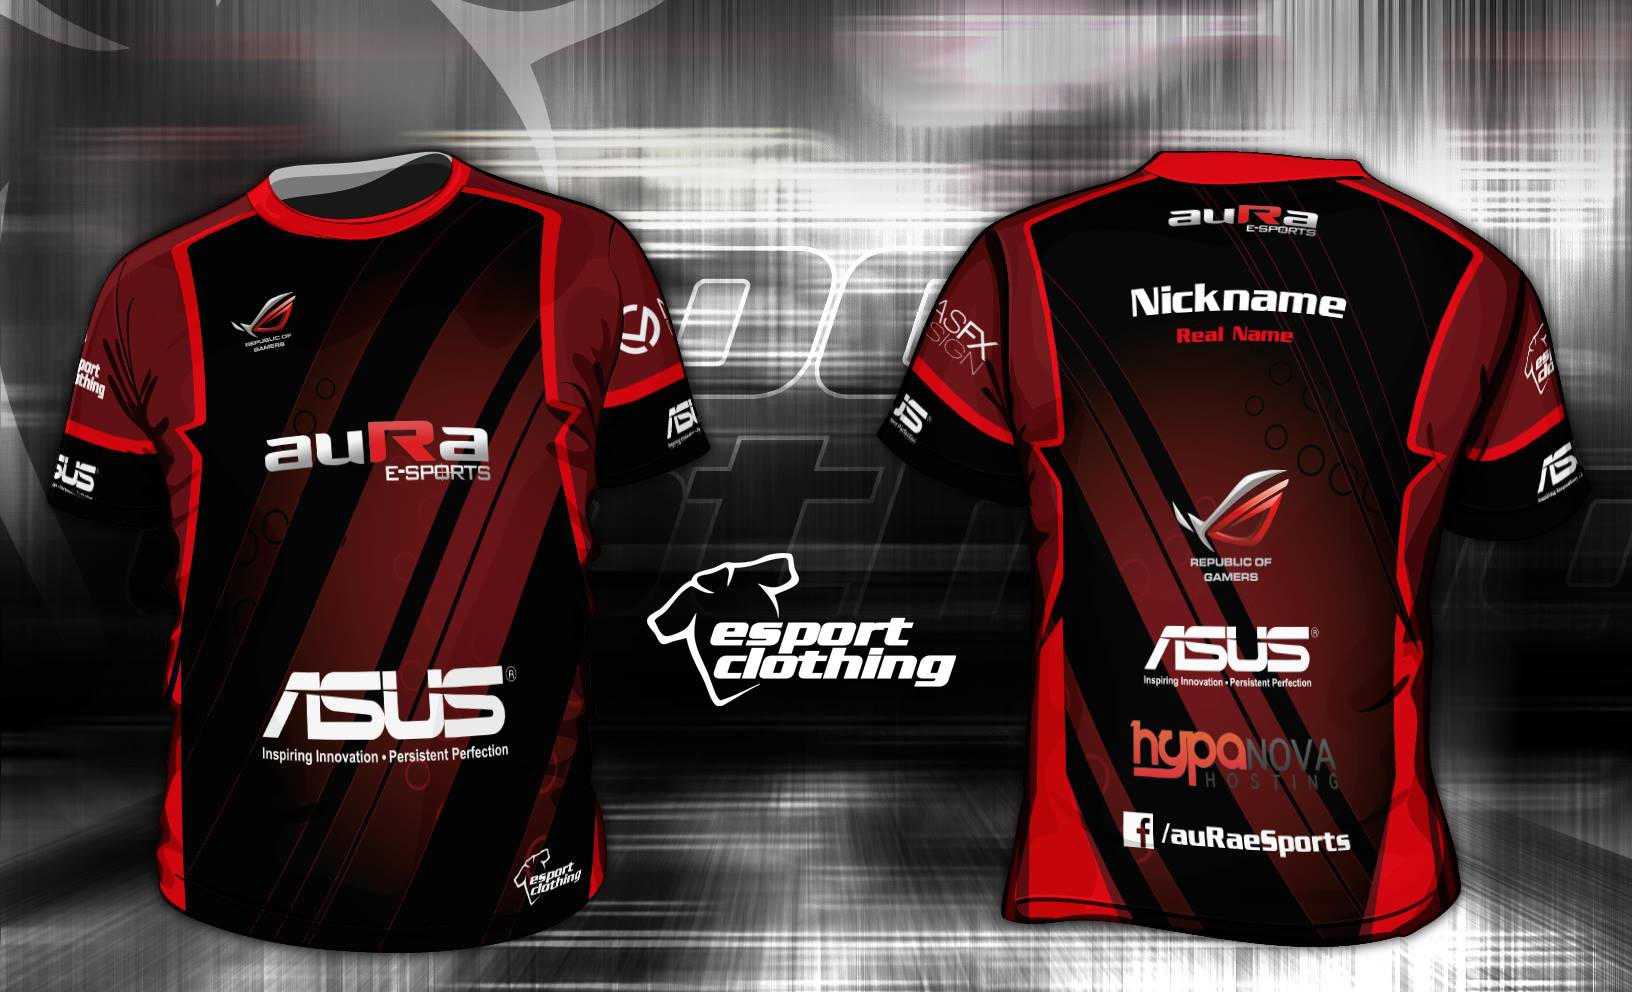 Aura eSports - Athlete Short Sleeve Jersey